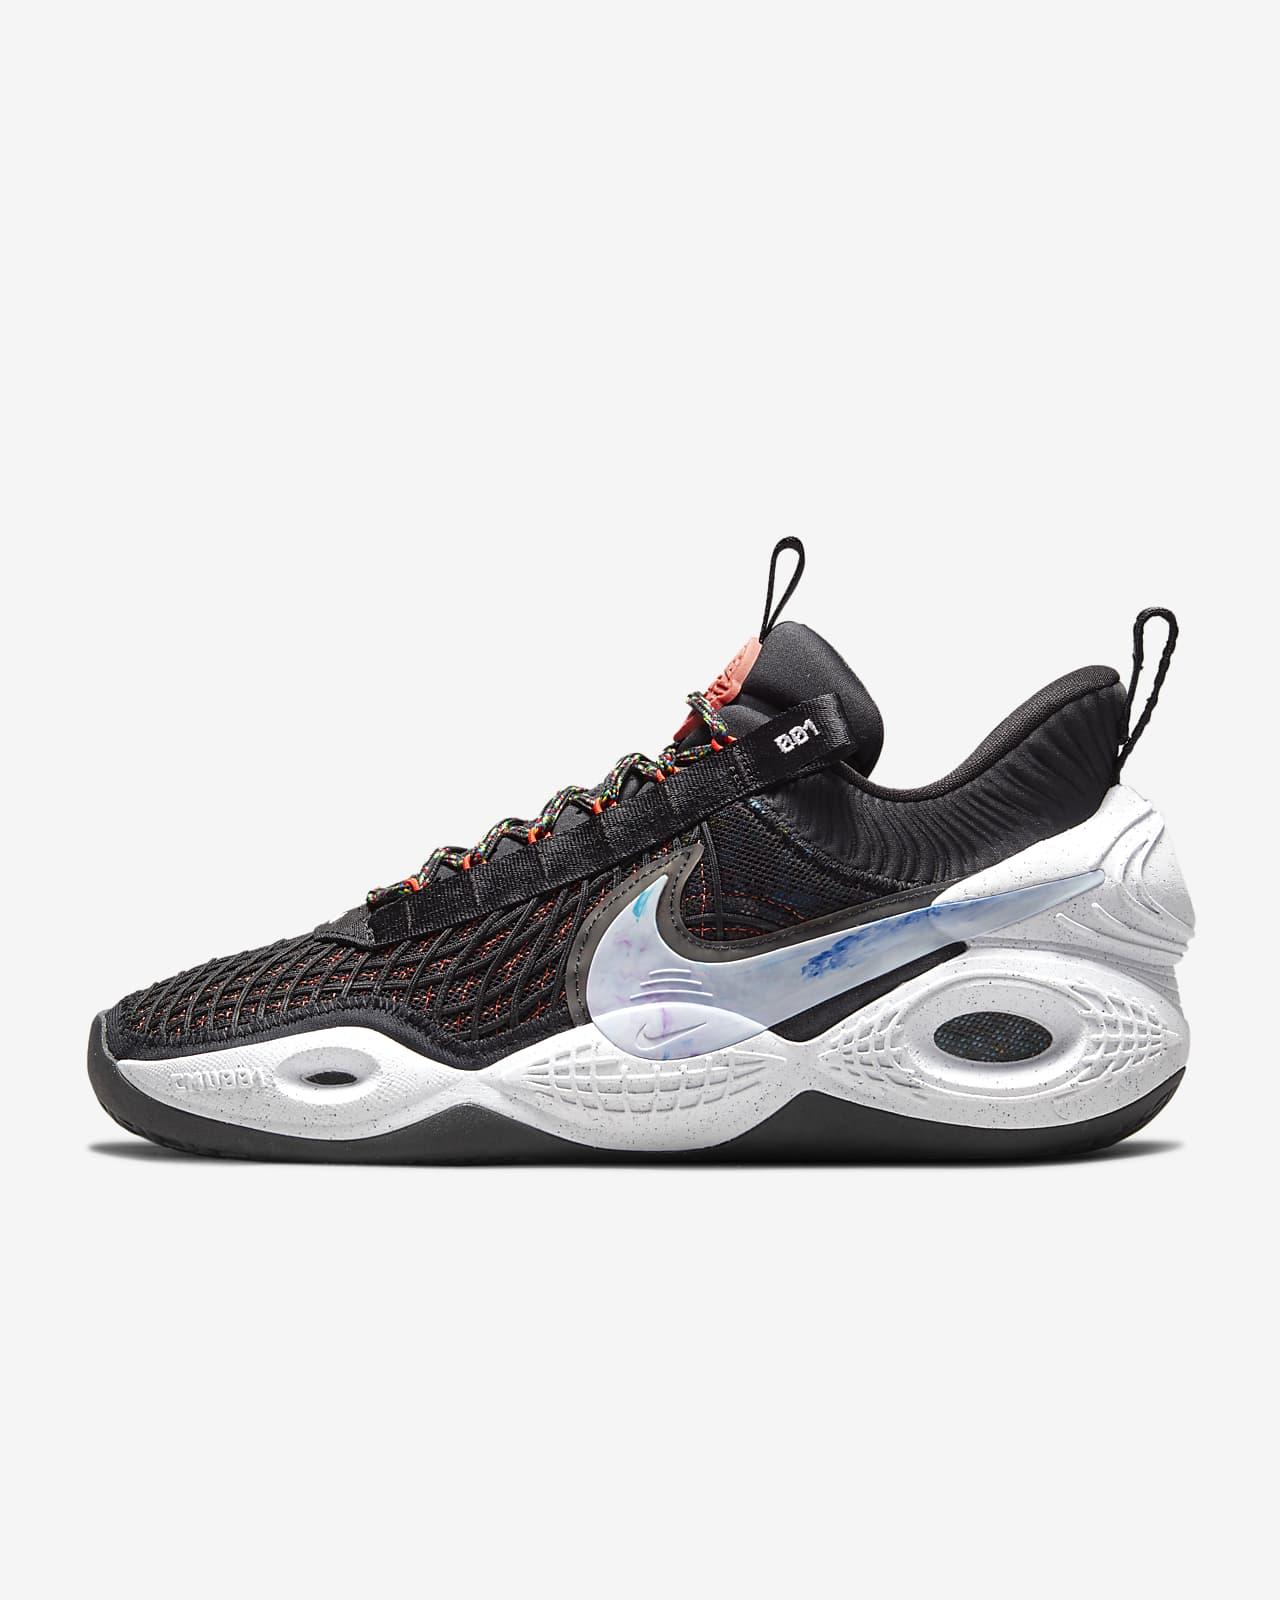 Nike Cosmic Unity (Team) Basketball Shoe